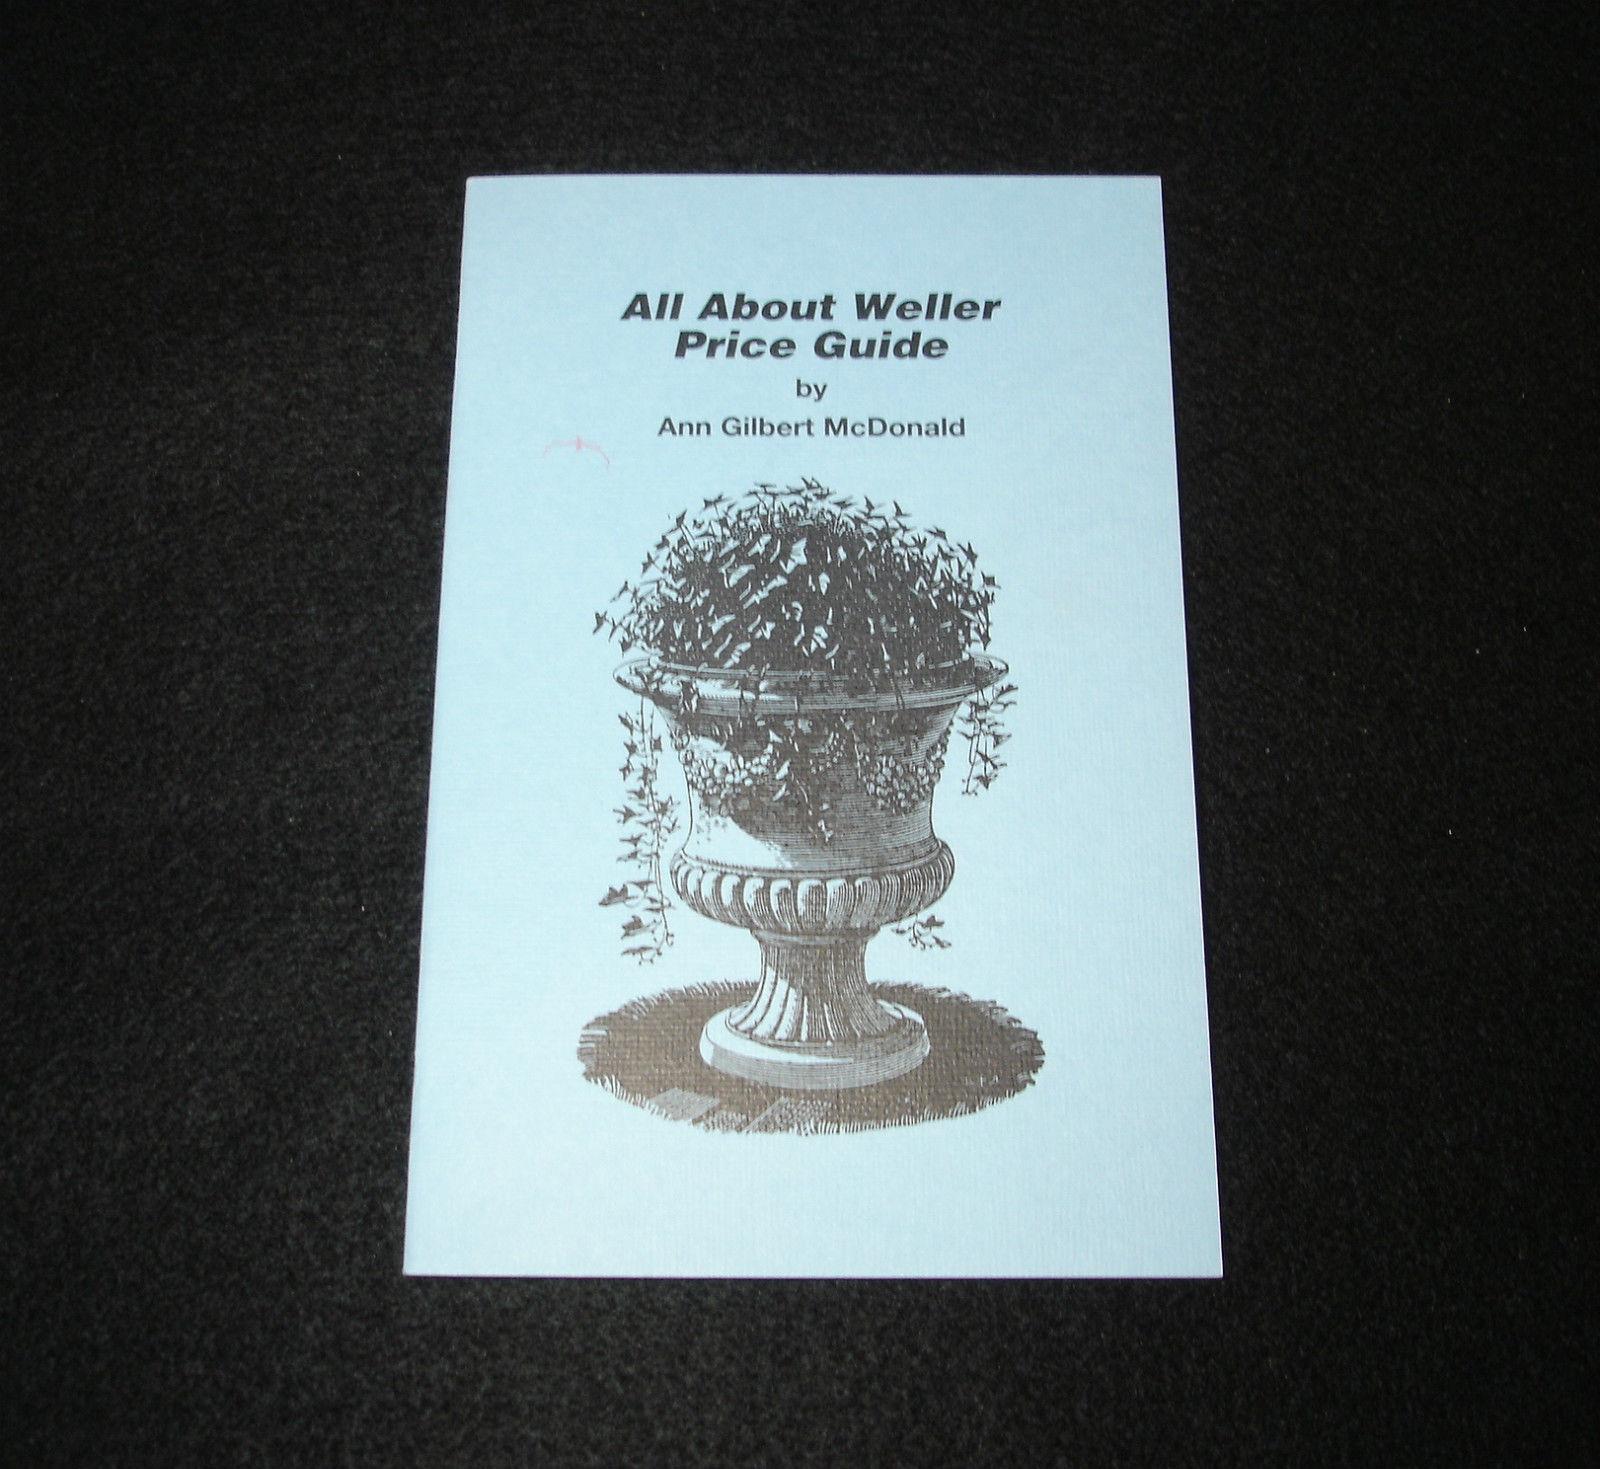 ALL ABOUT WELLER Ann Gilbert McDonald 1989 Paperback w/Price Guide